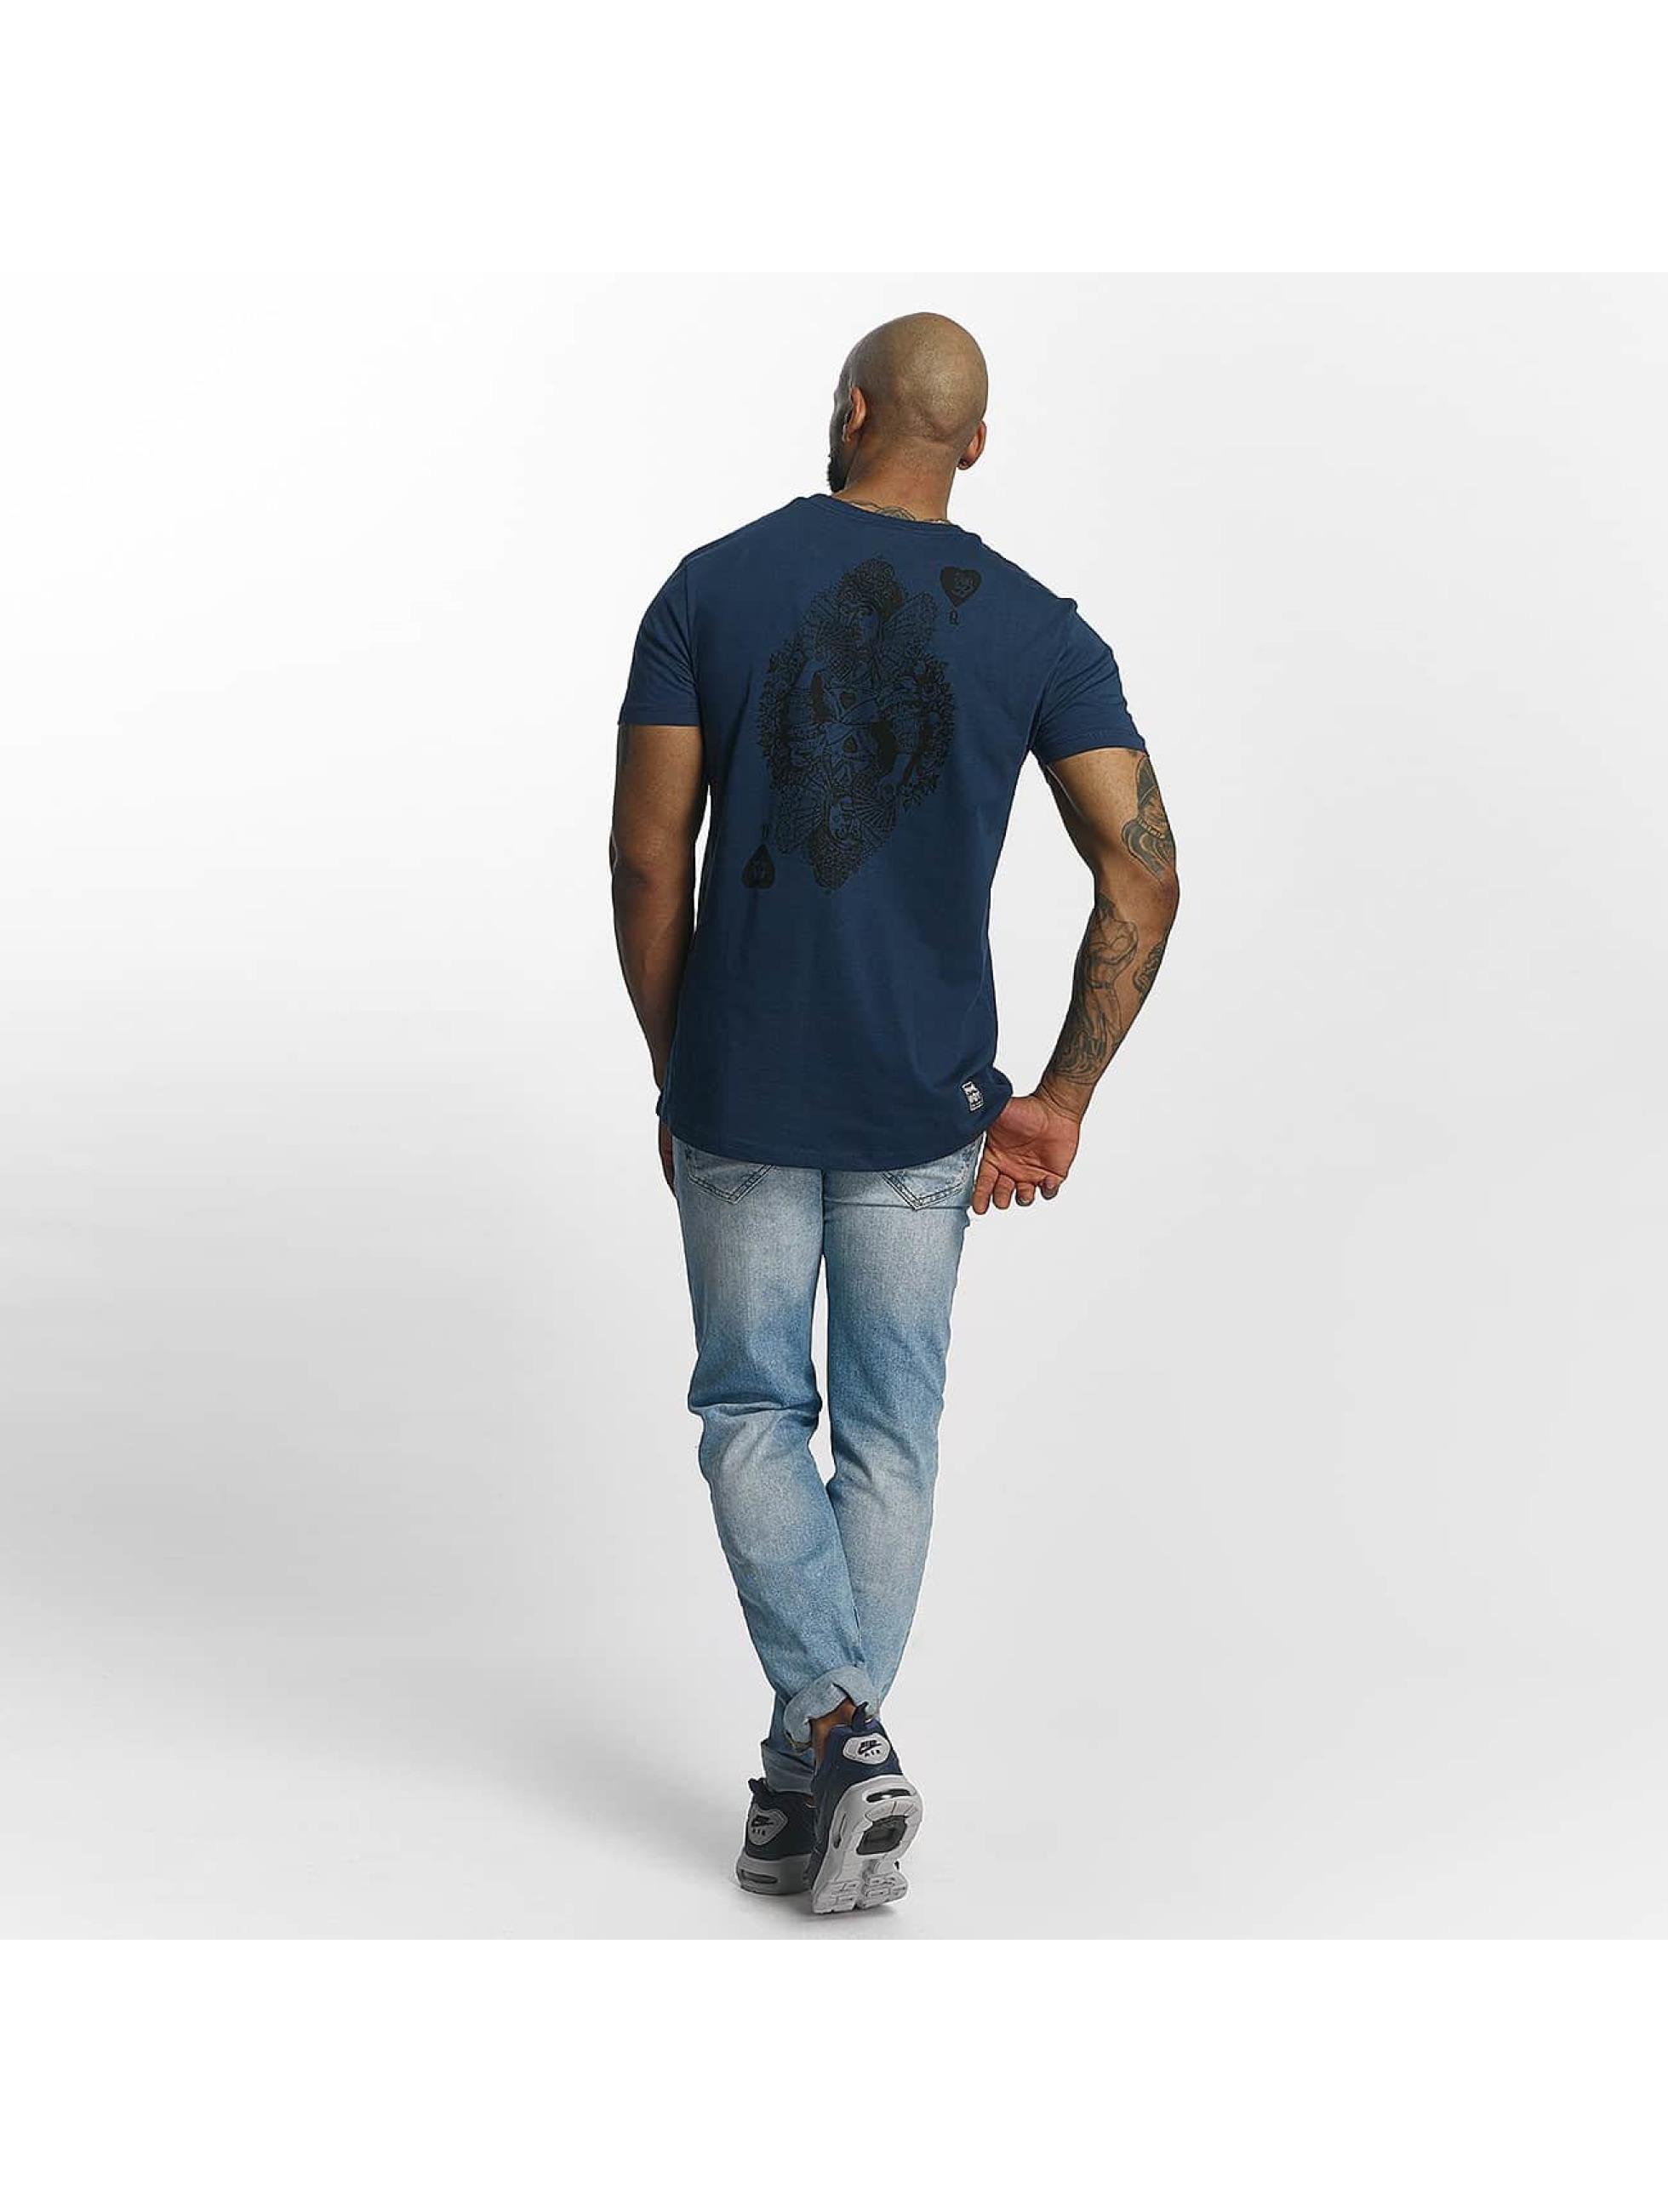 Homeboy T-Shirt Take You Home bleu